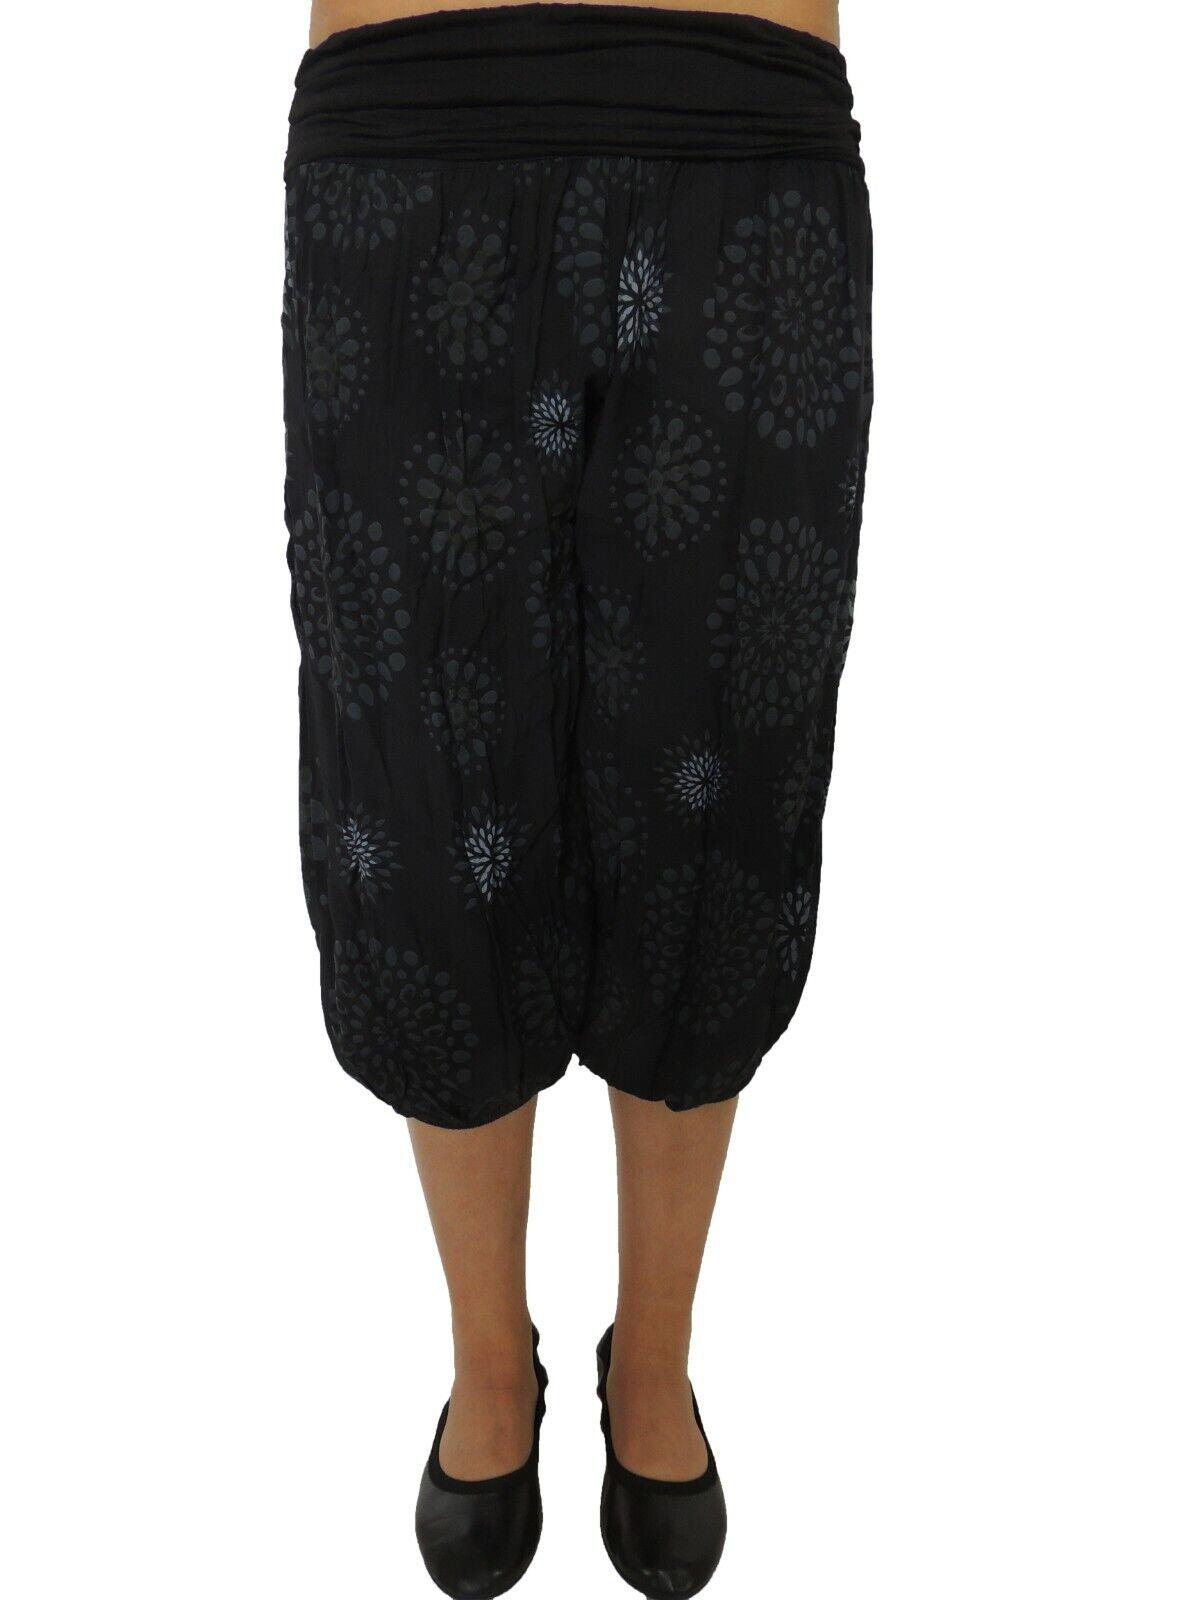 Kurz Harem Hose Größe 58 60 62 64 66 68 70 Plus Größe Pump Trousers Summer Hose 38